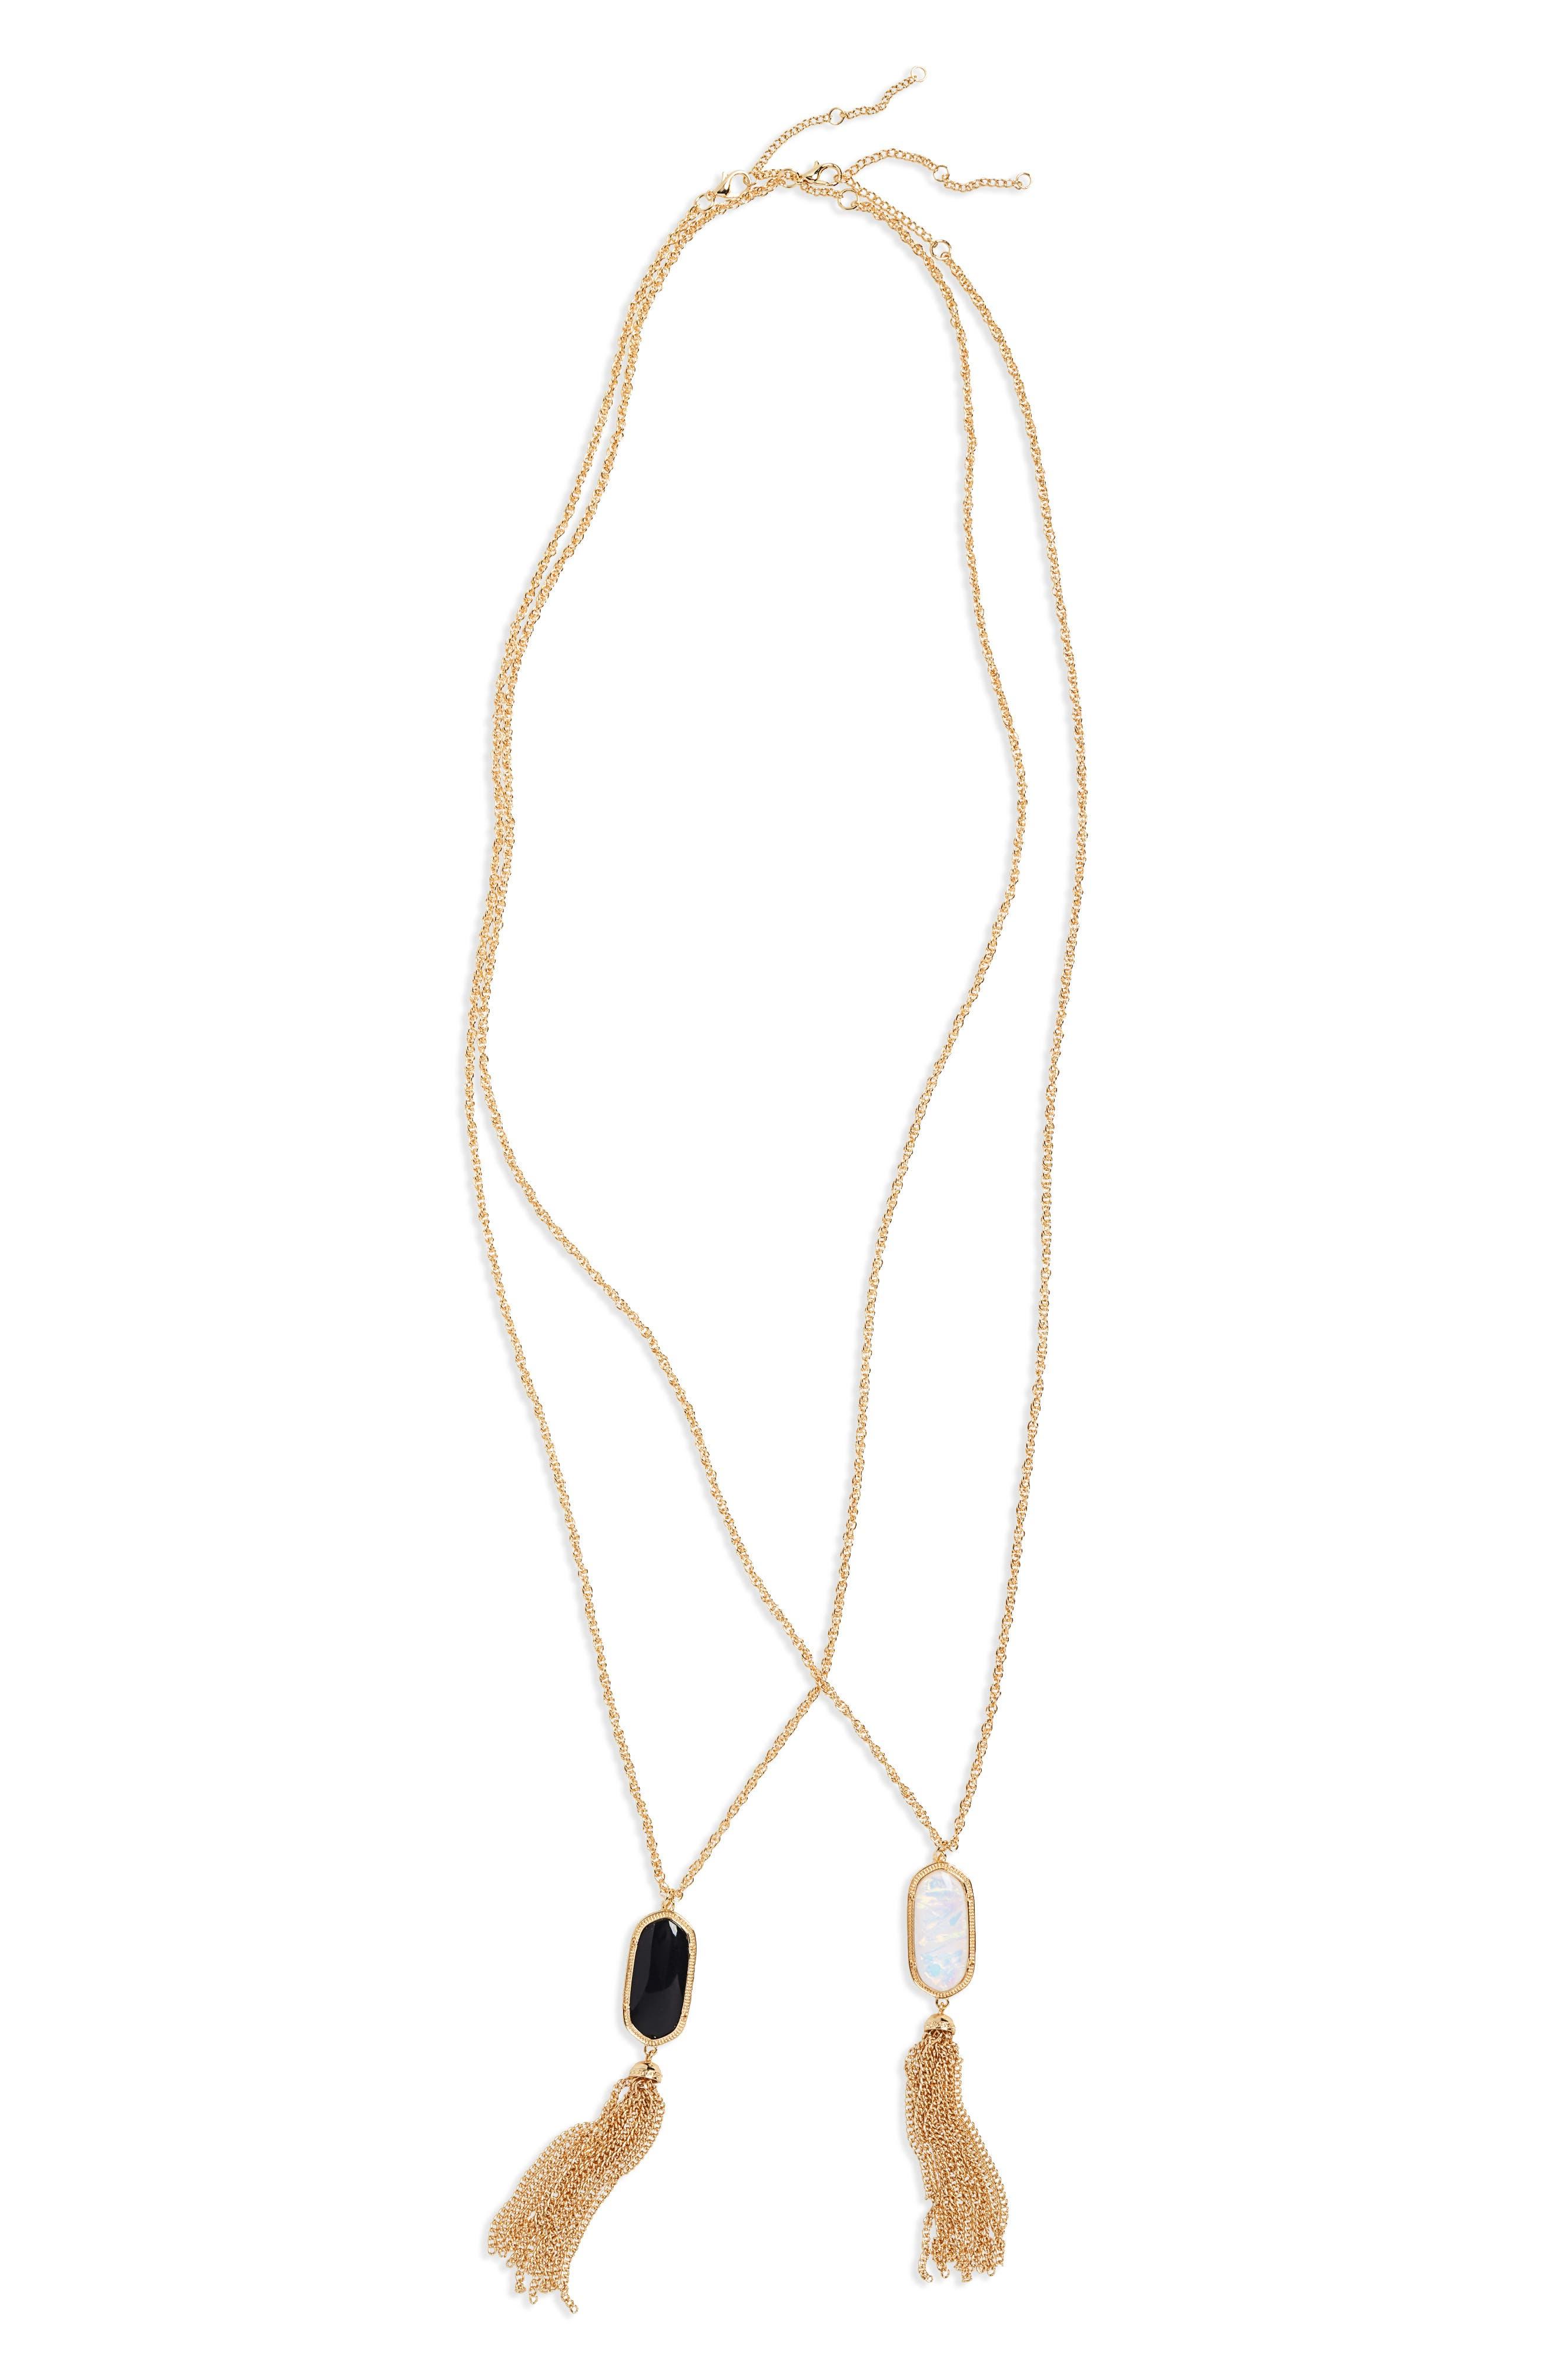 2-Pack Stone Tassel Pendant Necklaces,                         Main,                         color, 710